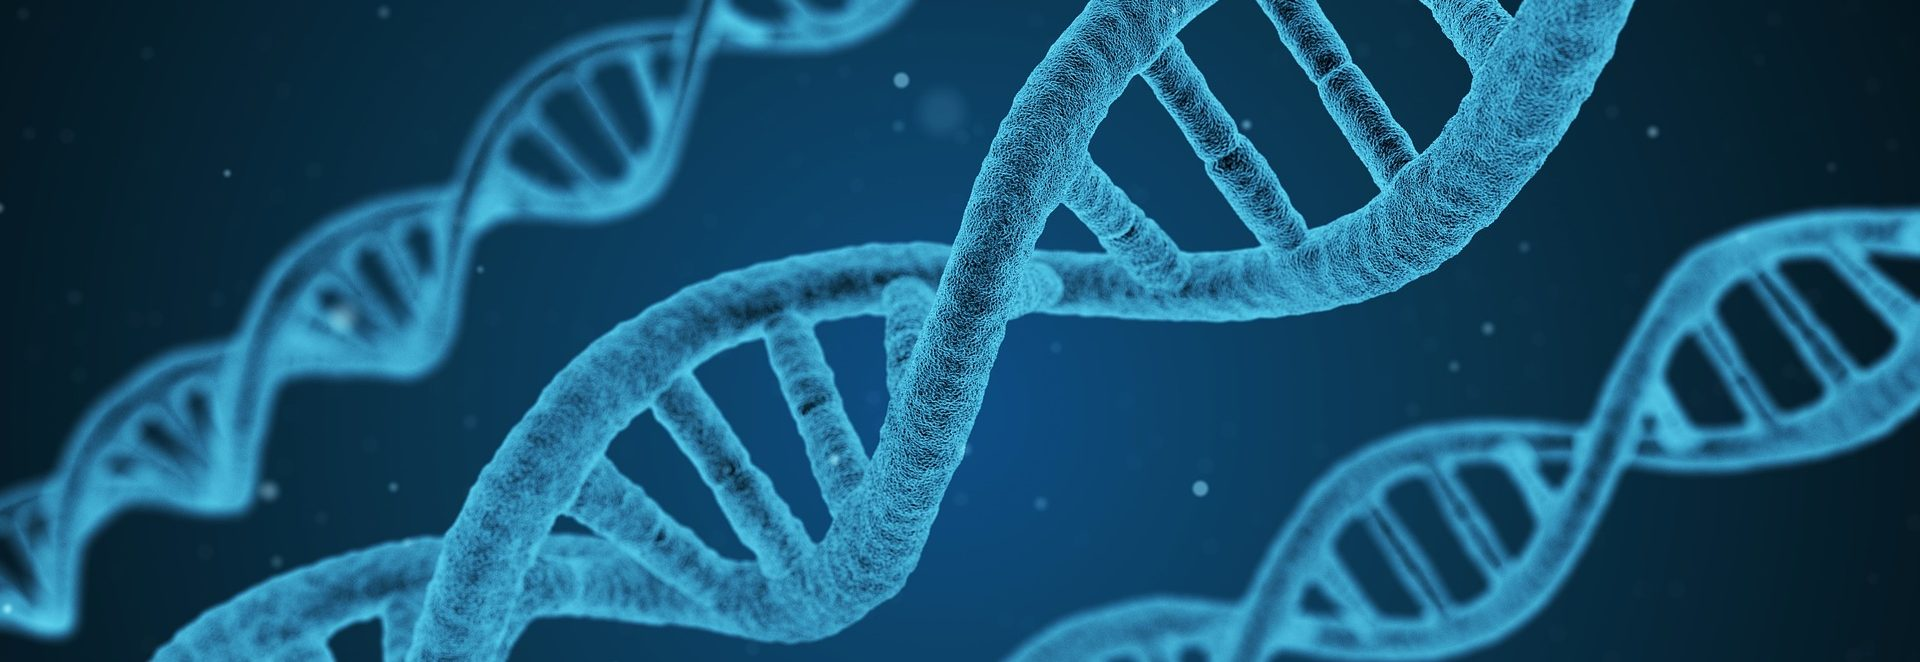 three strands of DNA